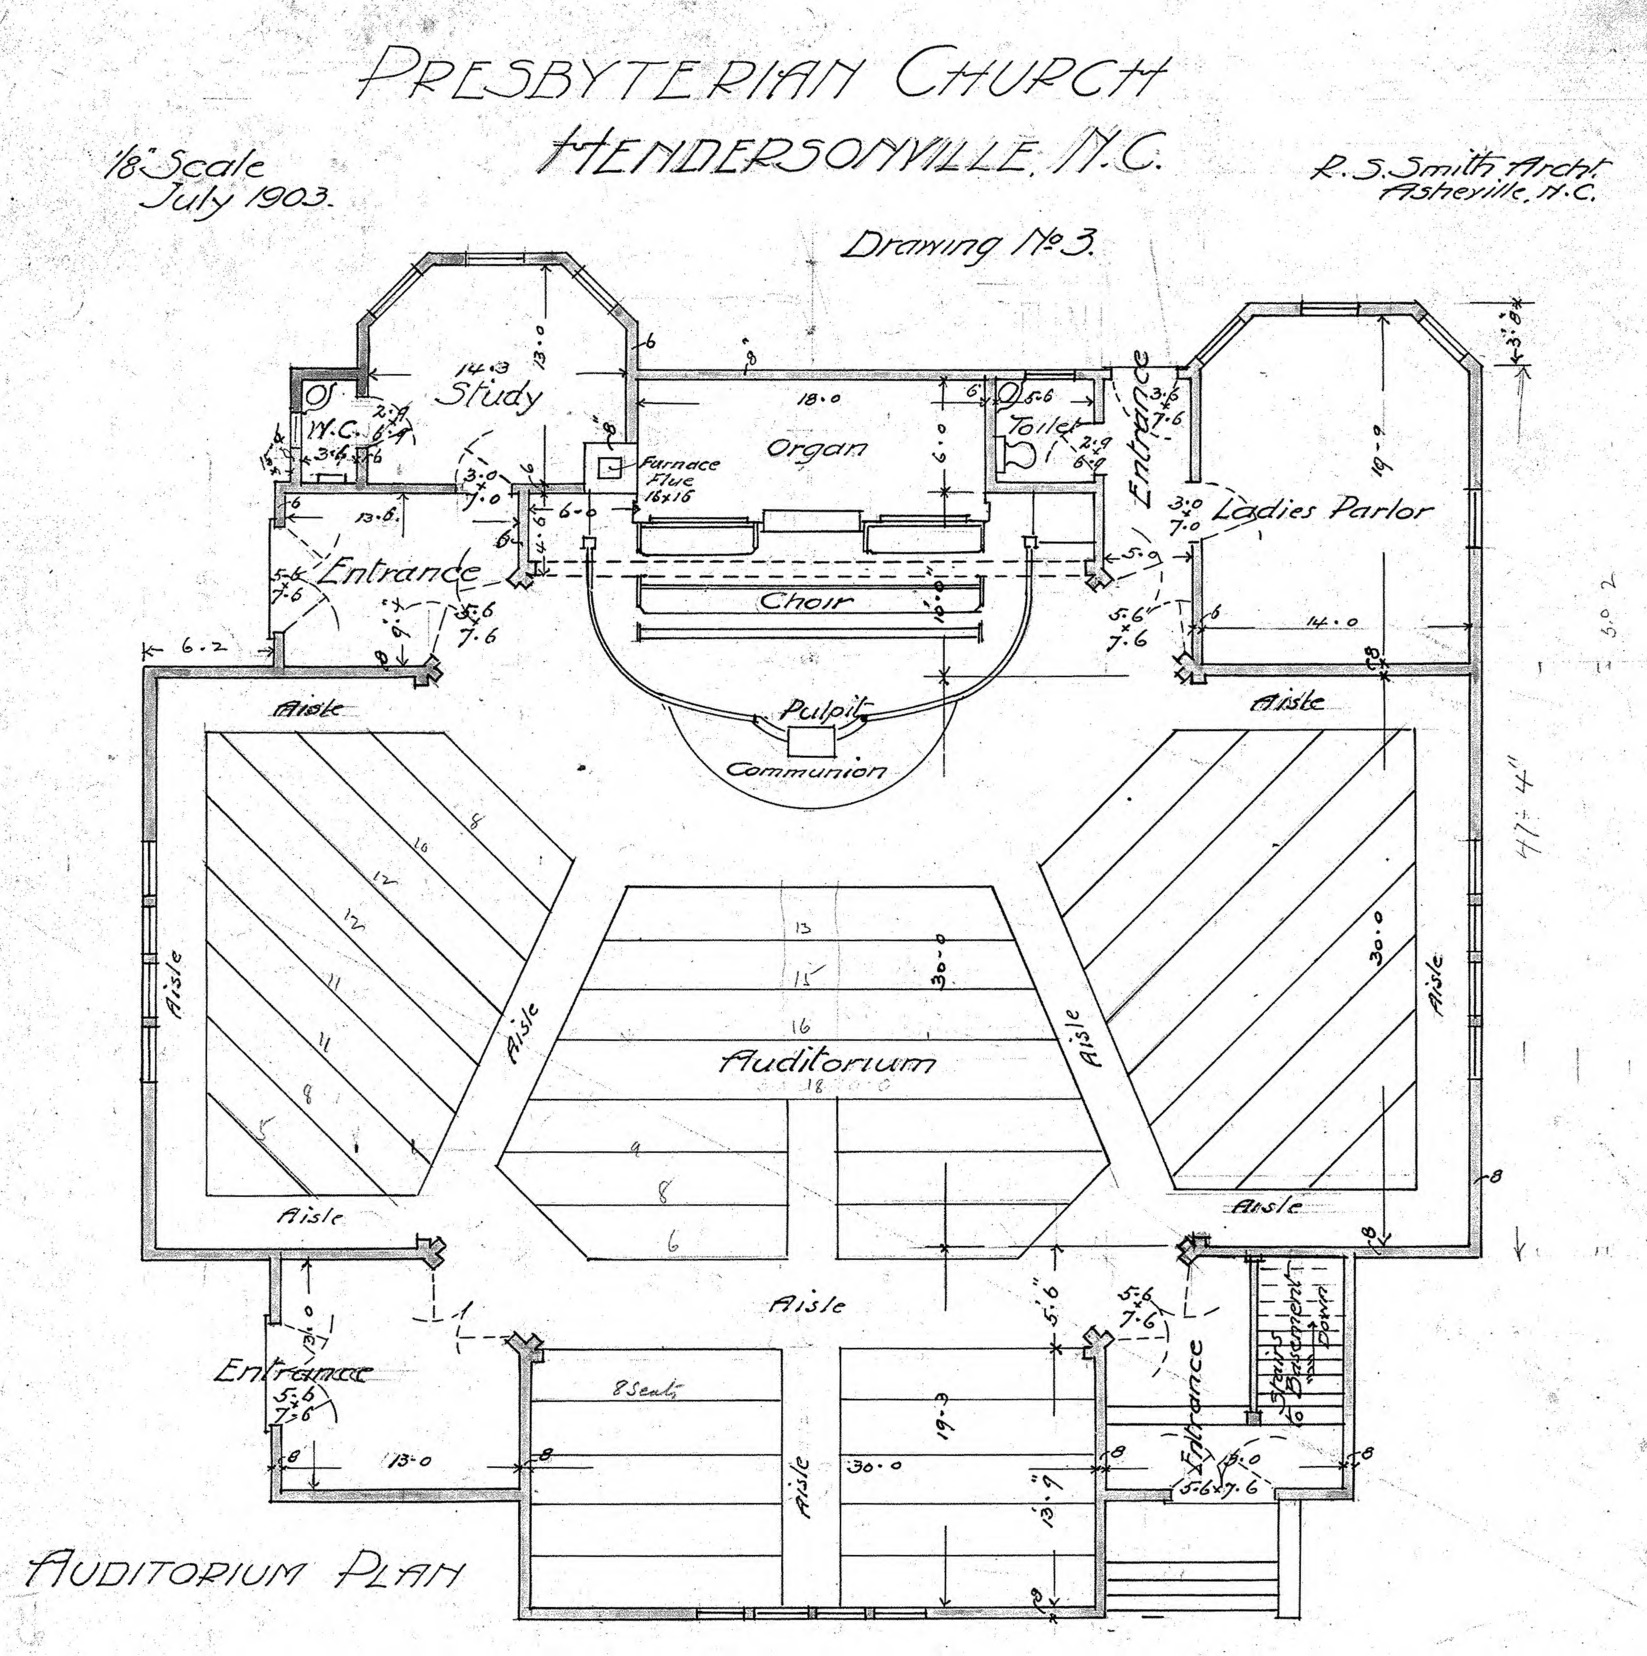 Presbyterian Church Auditorium Plan Drawing No 3